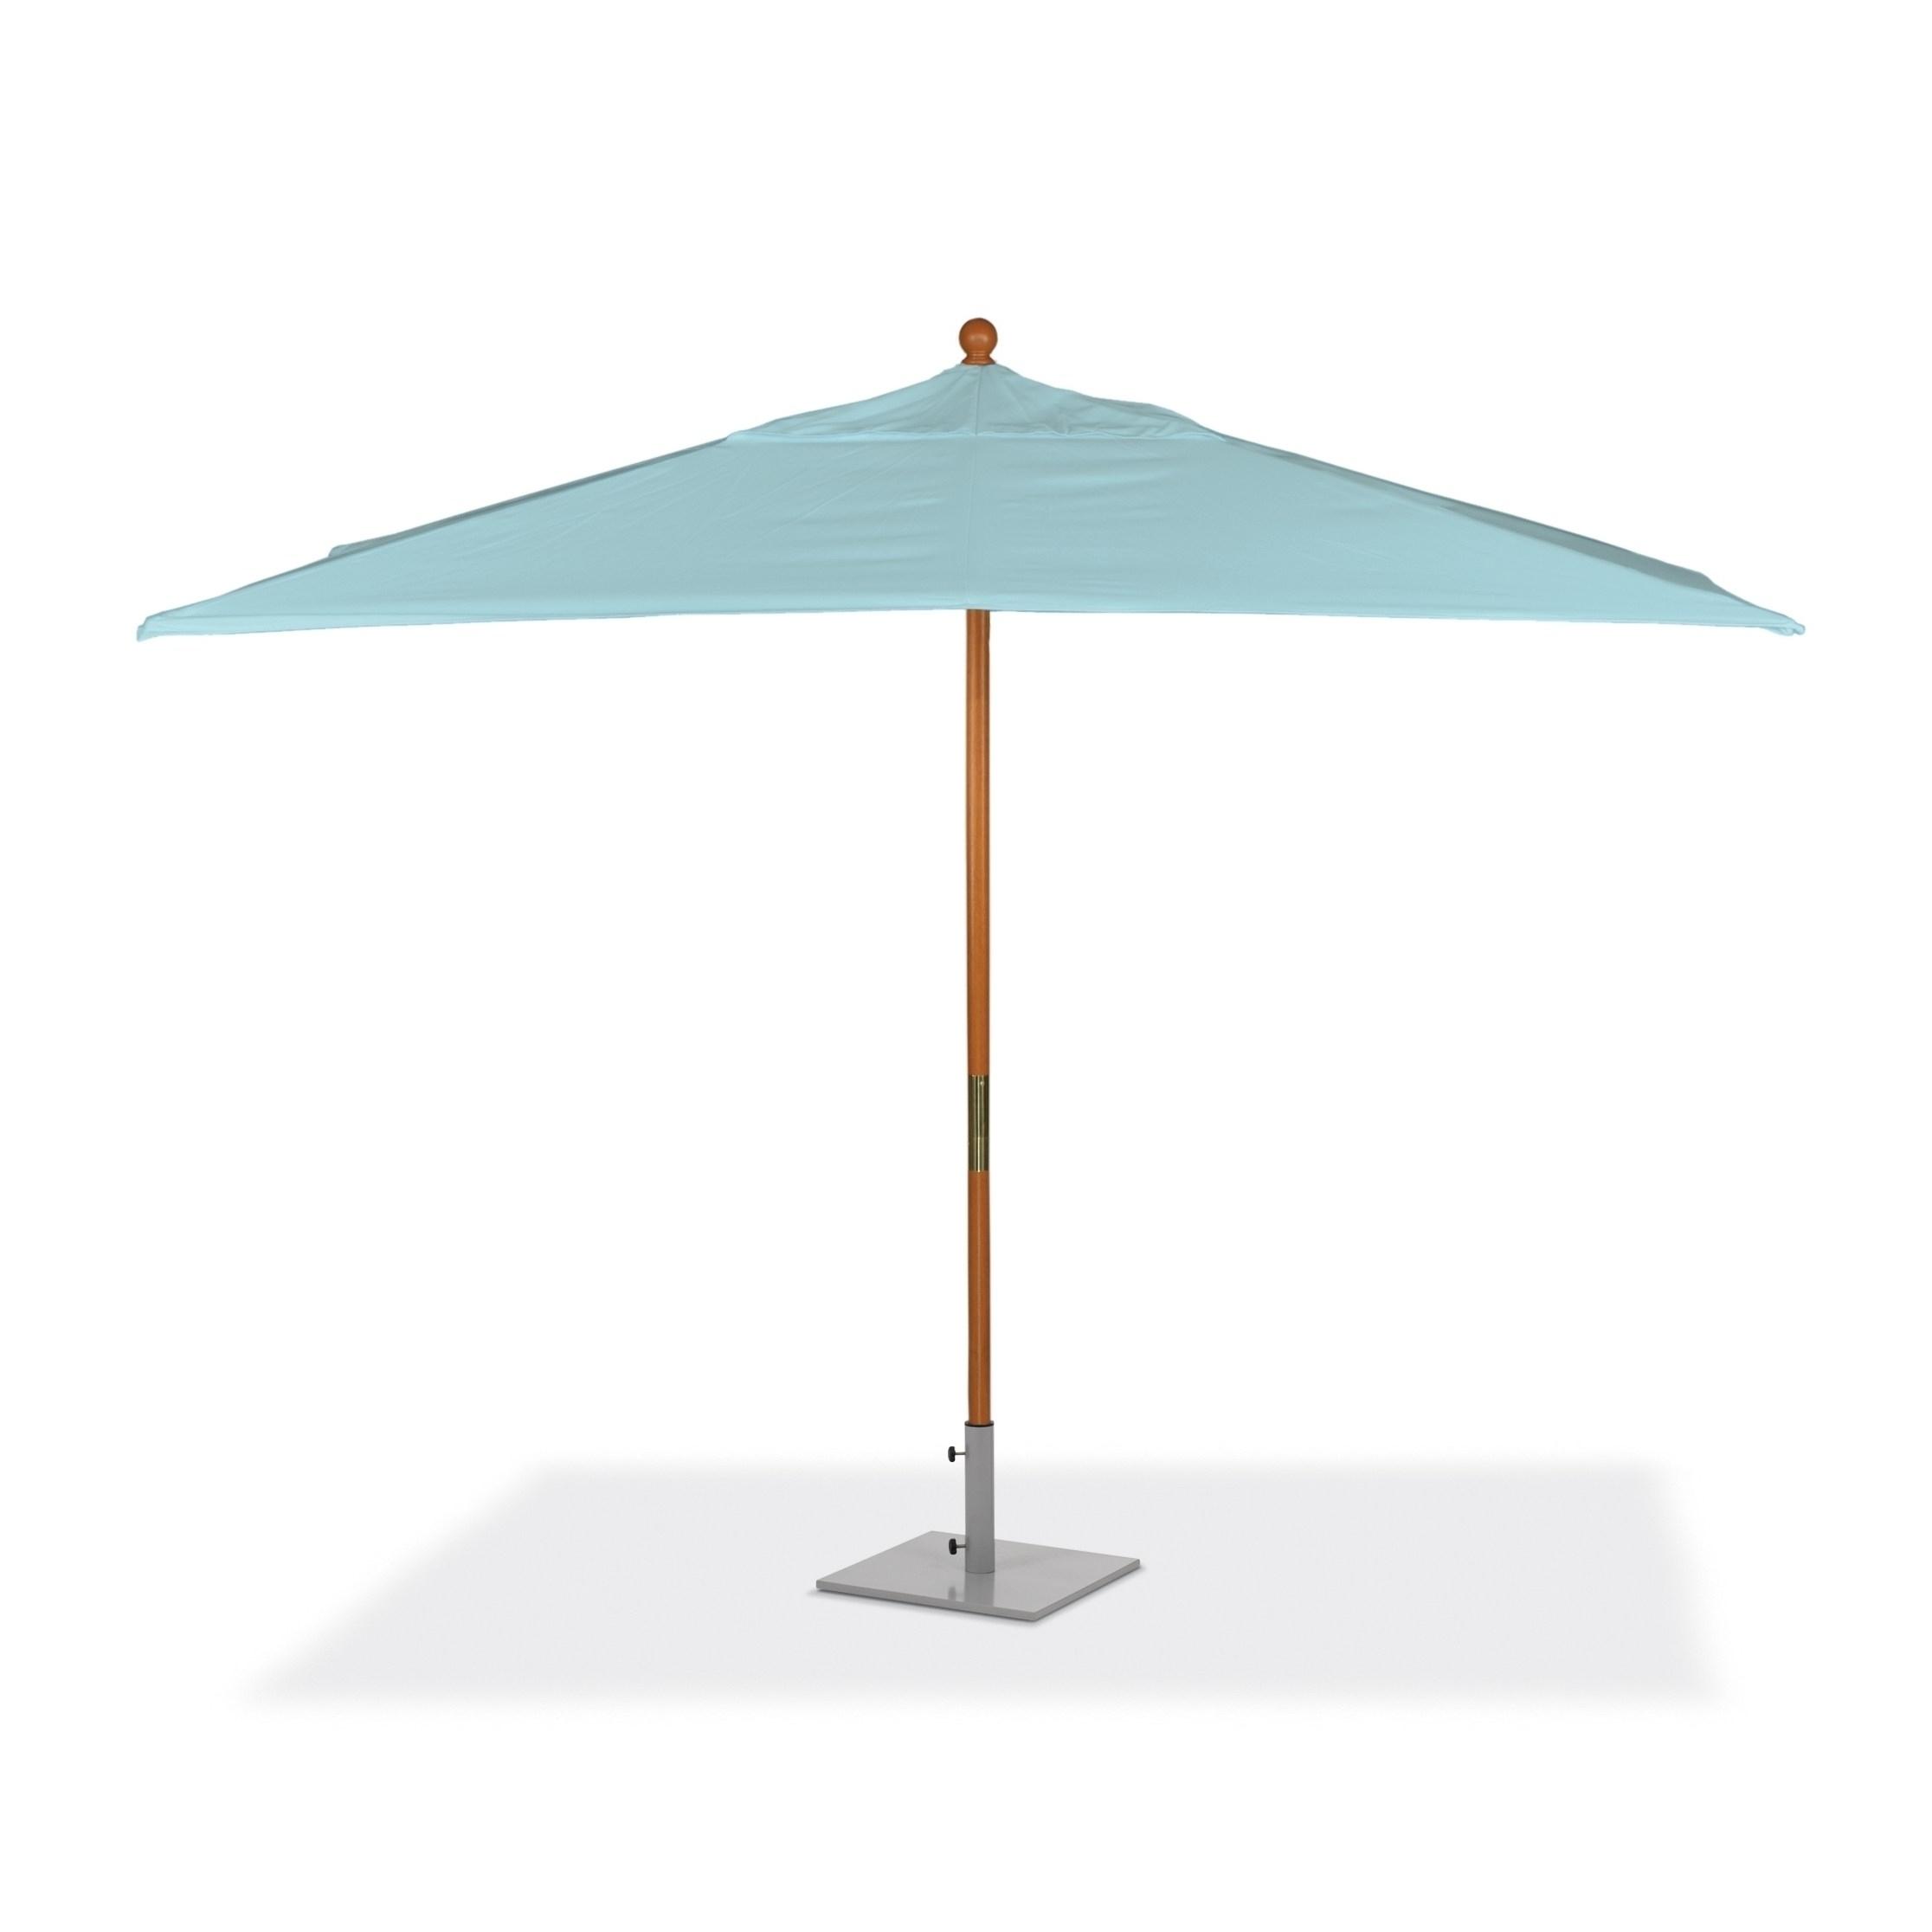 Famous Rectangular Sunbrella Patio Umbrellas With Regard To Shop Oxford Garden 10 Feet Rectangular Mineral Blue Sunbrella Fabric (View 17 of 20)